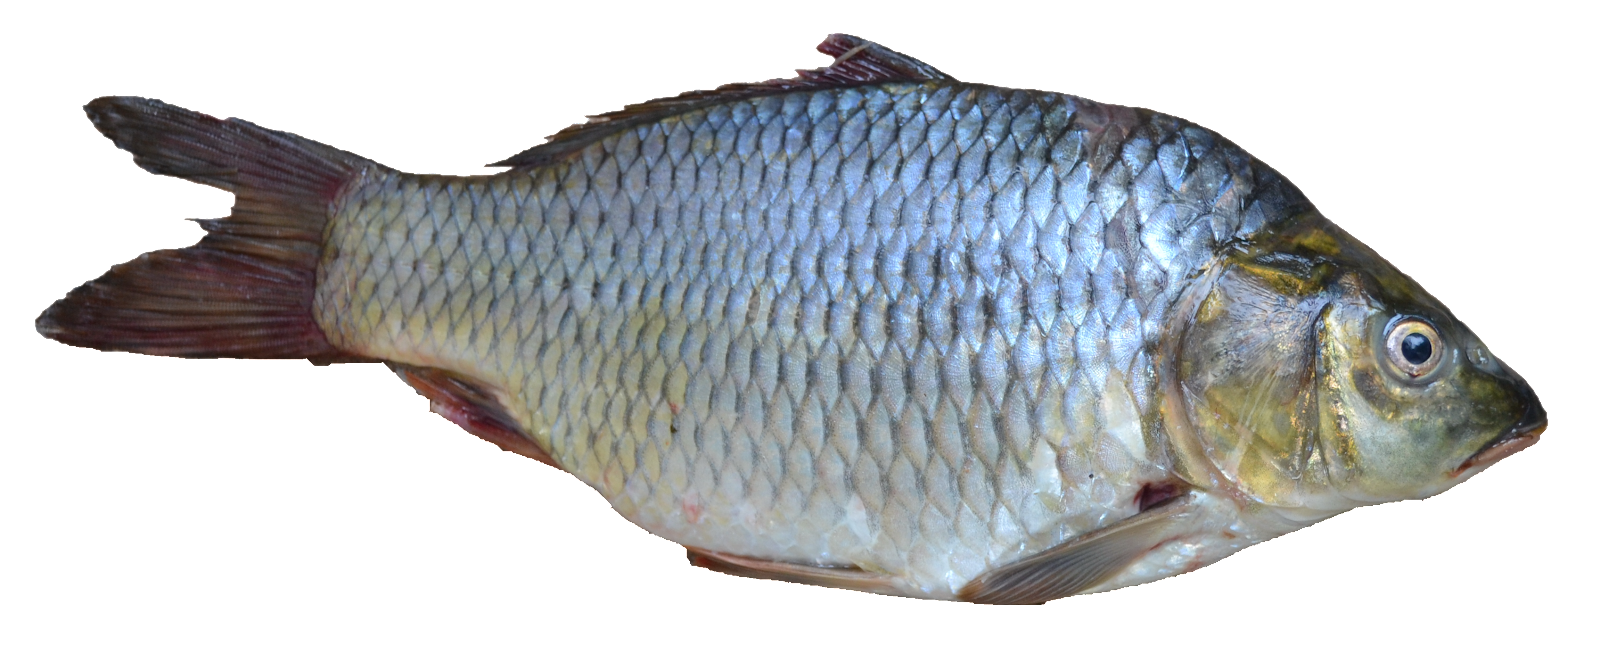 File:Fish - Puntius sarana from Kerala (India).png - Wikimedia Commons